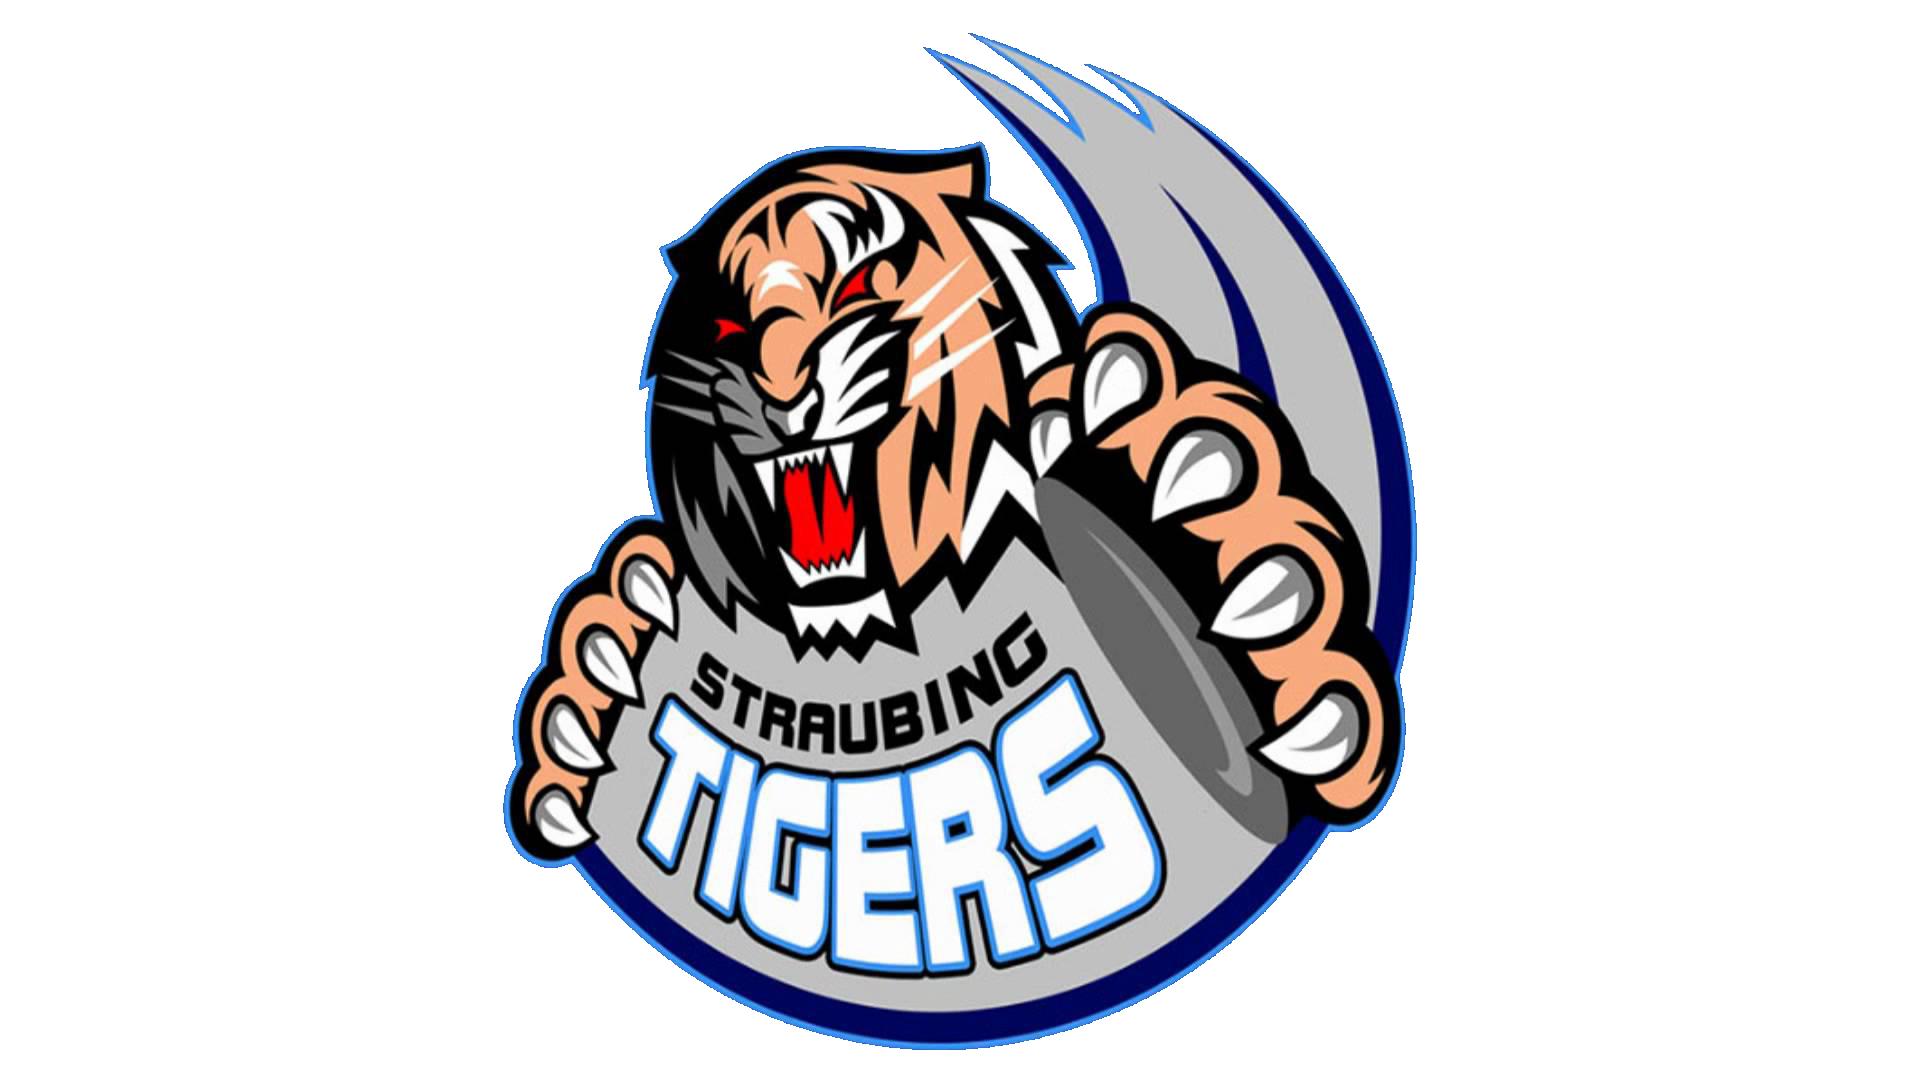 straubing-tigers-1